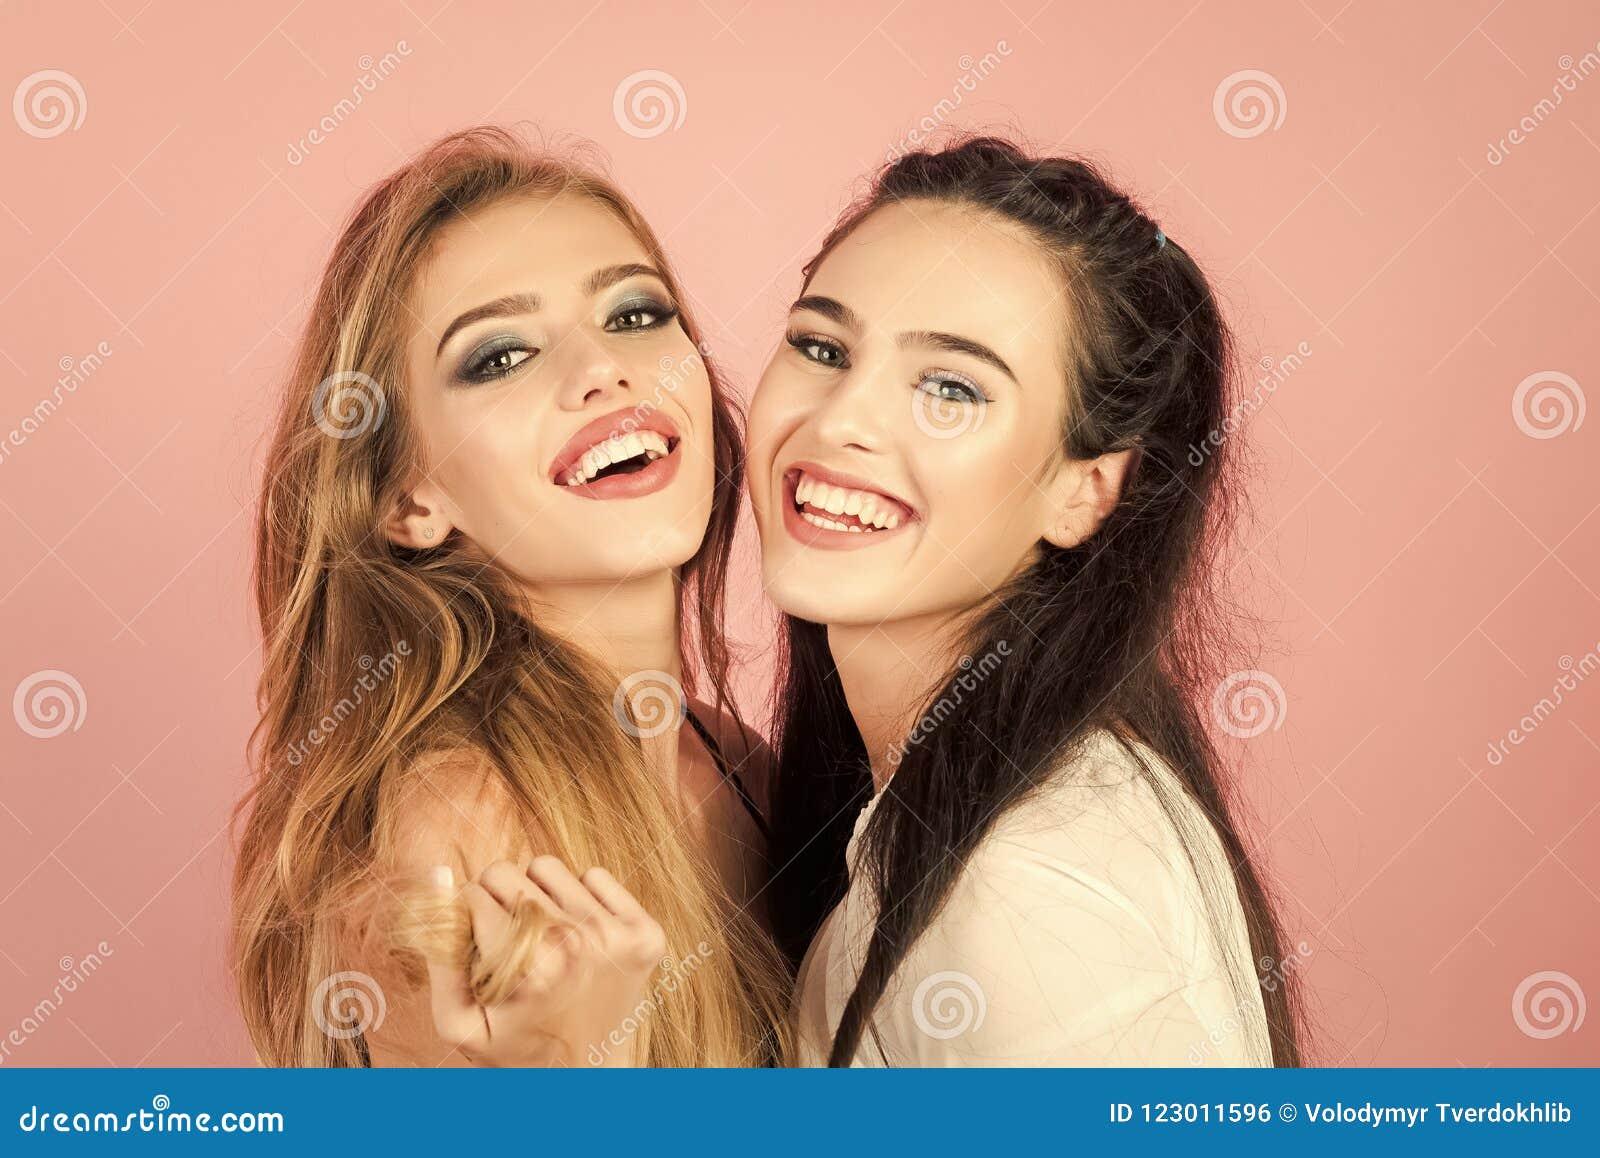 Lesbian friendship and love